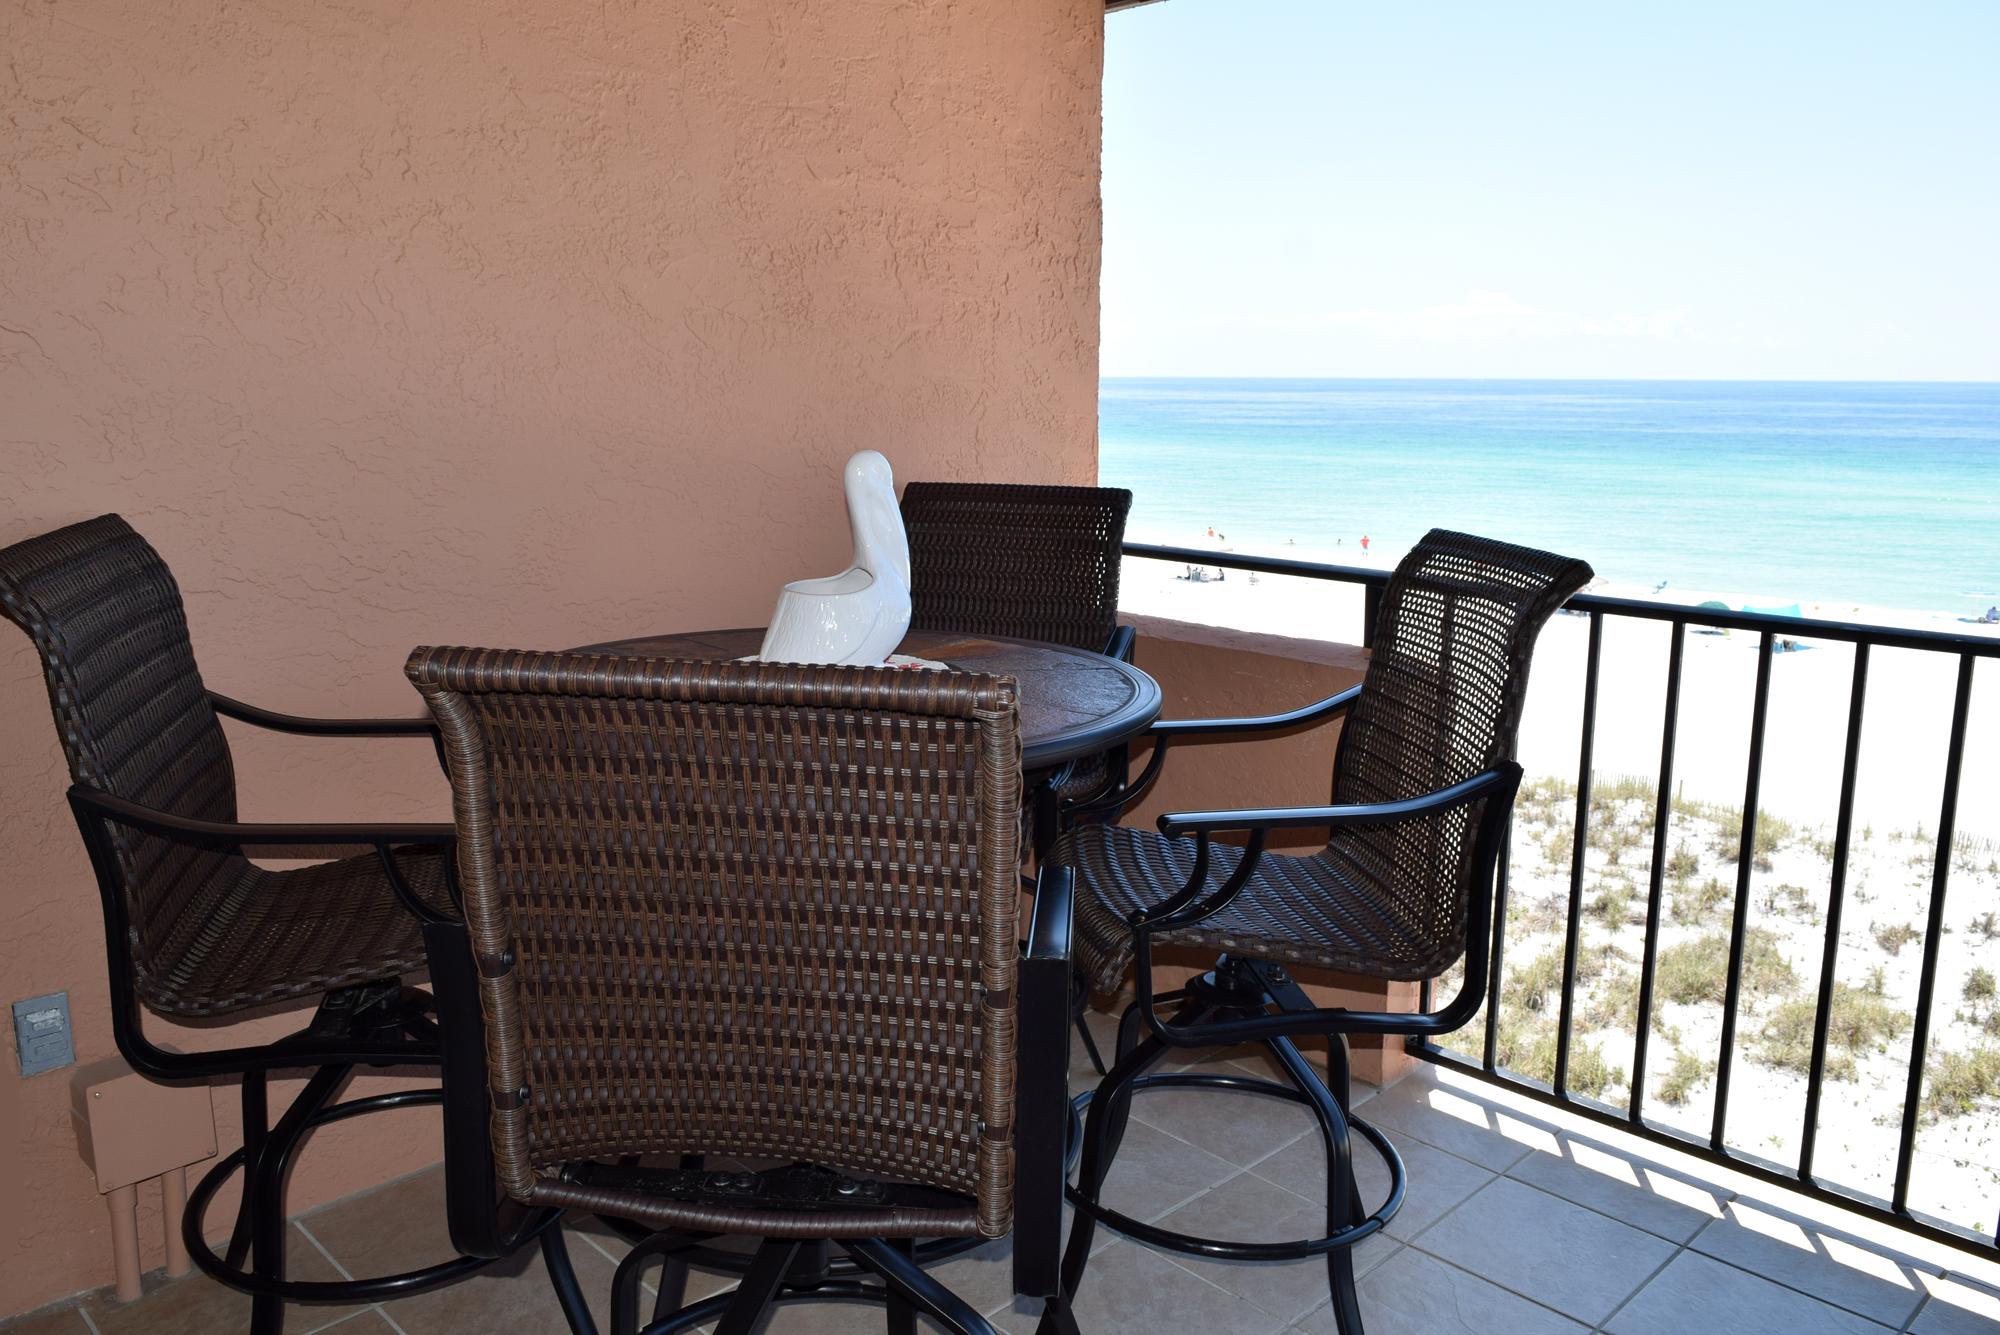 Gulf Winds #404 Condo rental in Gulf Winds Pensacola ~ Pensacola Beach Vacation Rentals by BeachGuide in Pensacola Beach Florida - #20